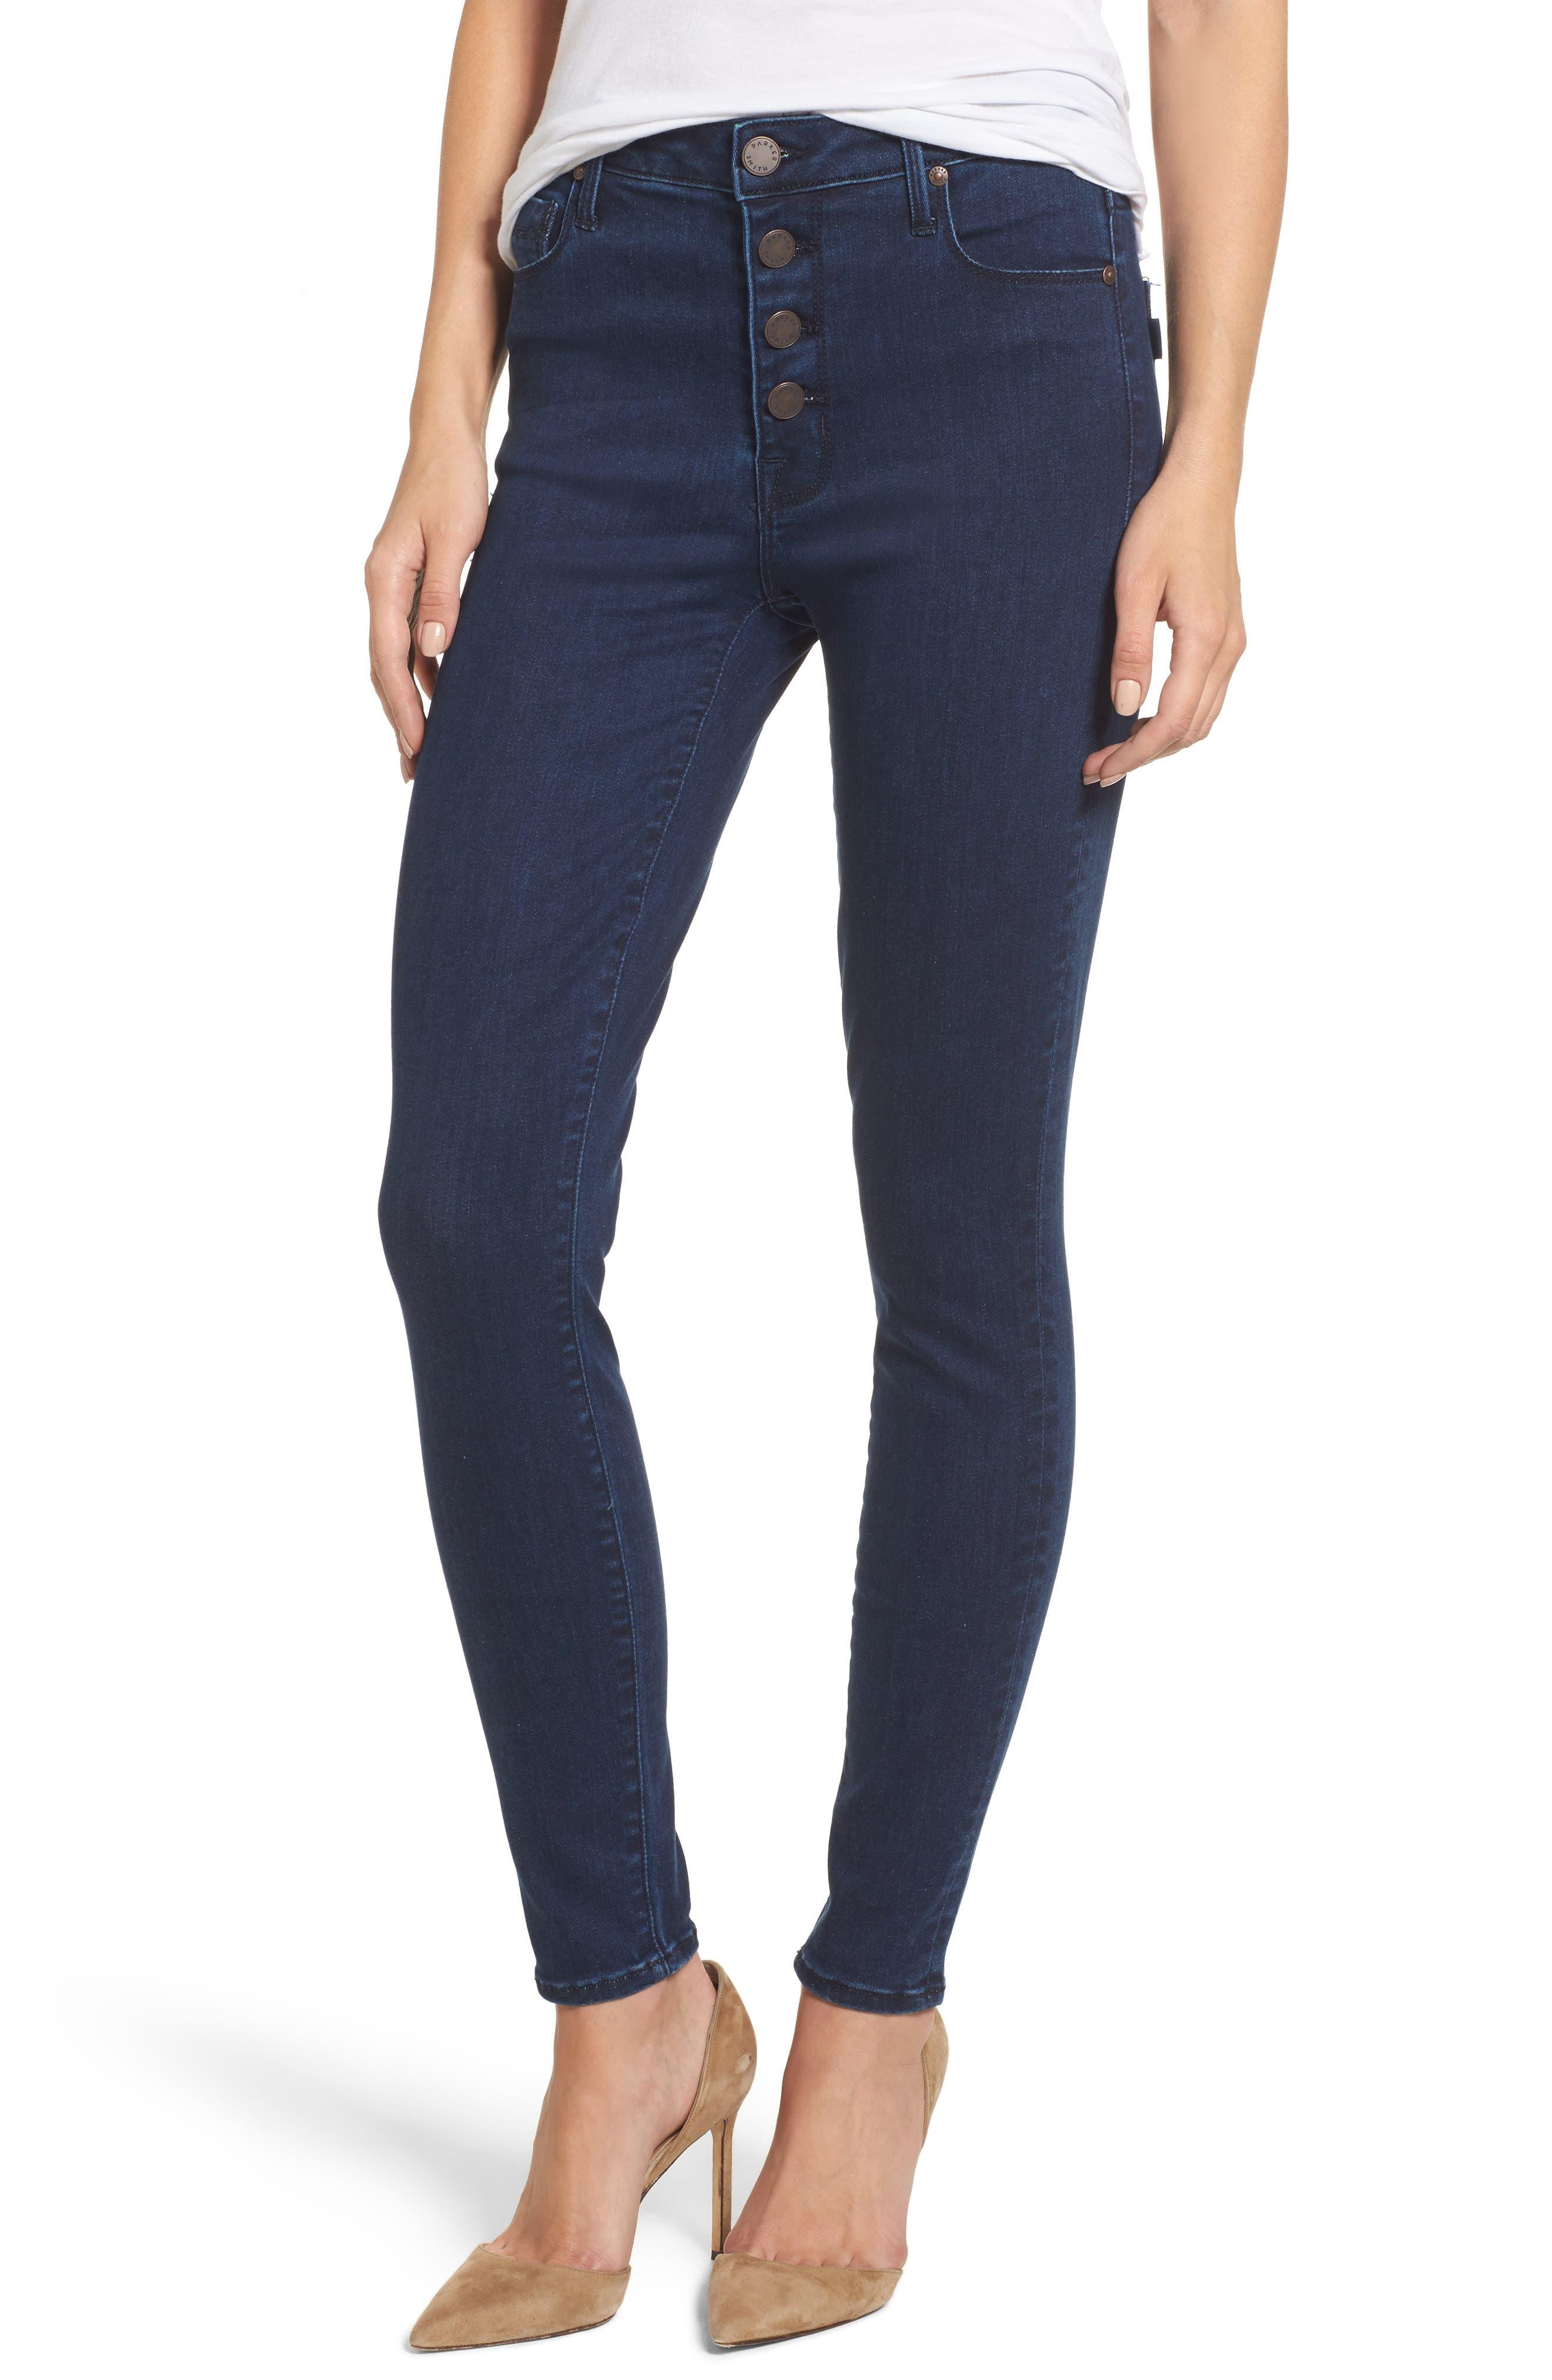 Bombshell High Waist Skinny Jeans,                         Main,                         color, Sky Line